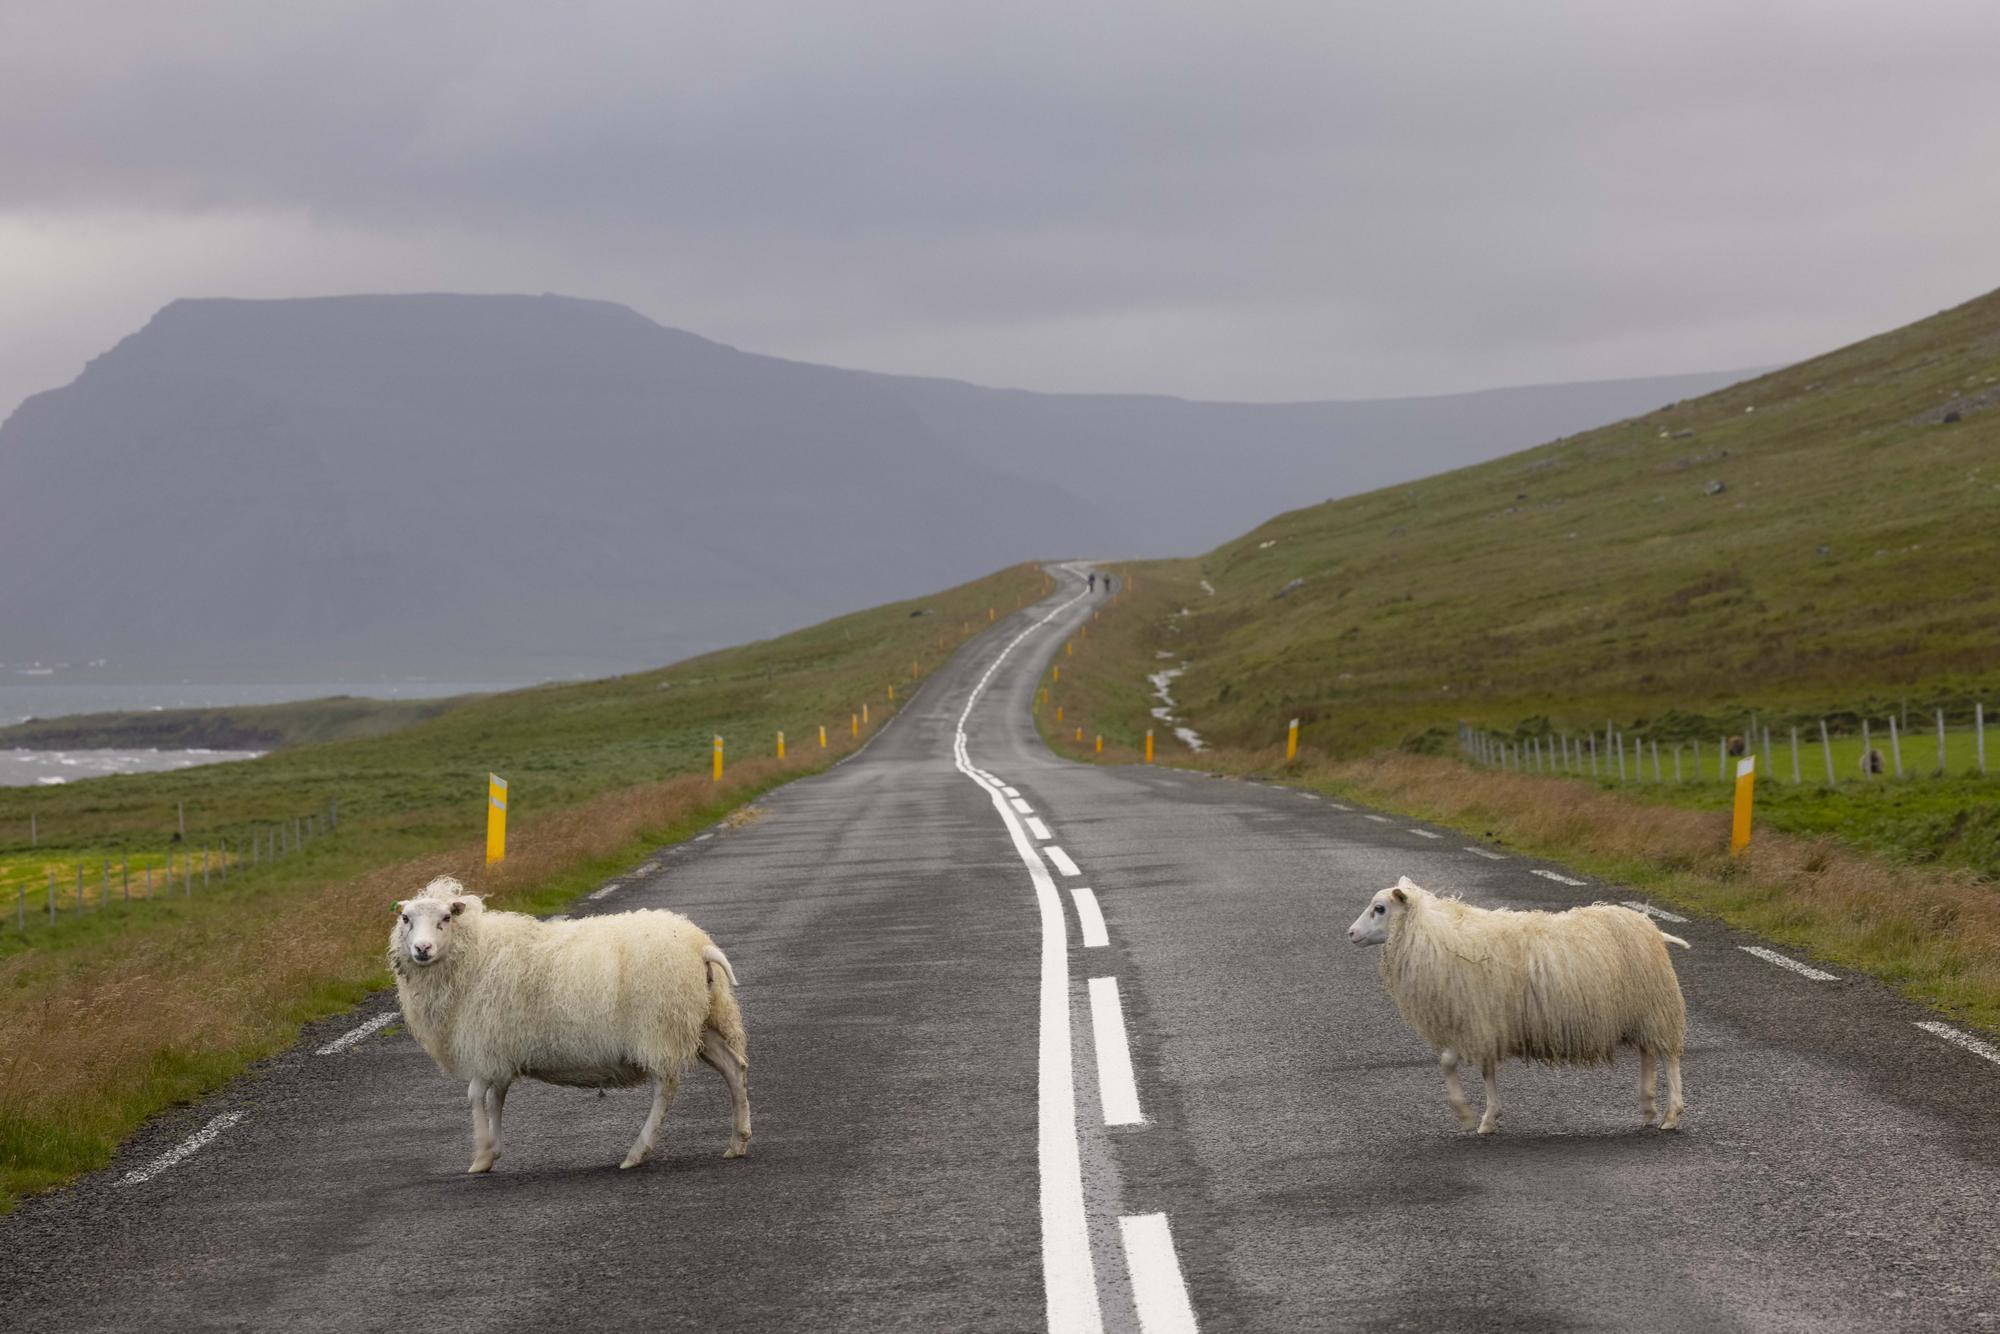 46 Westfjords Way — Rugile Kaladyte — Part Three